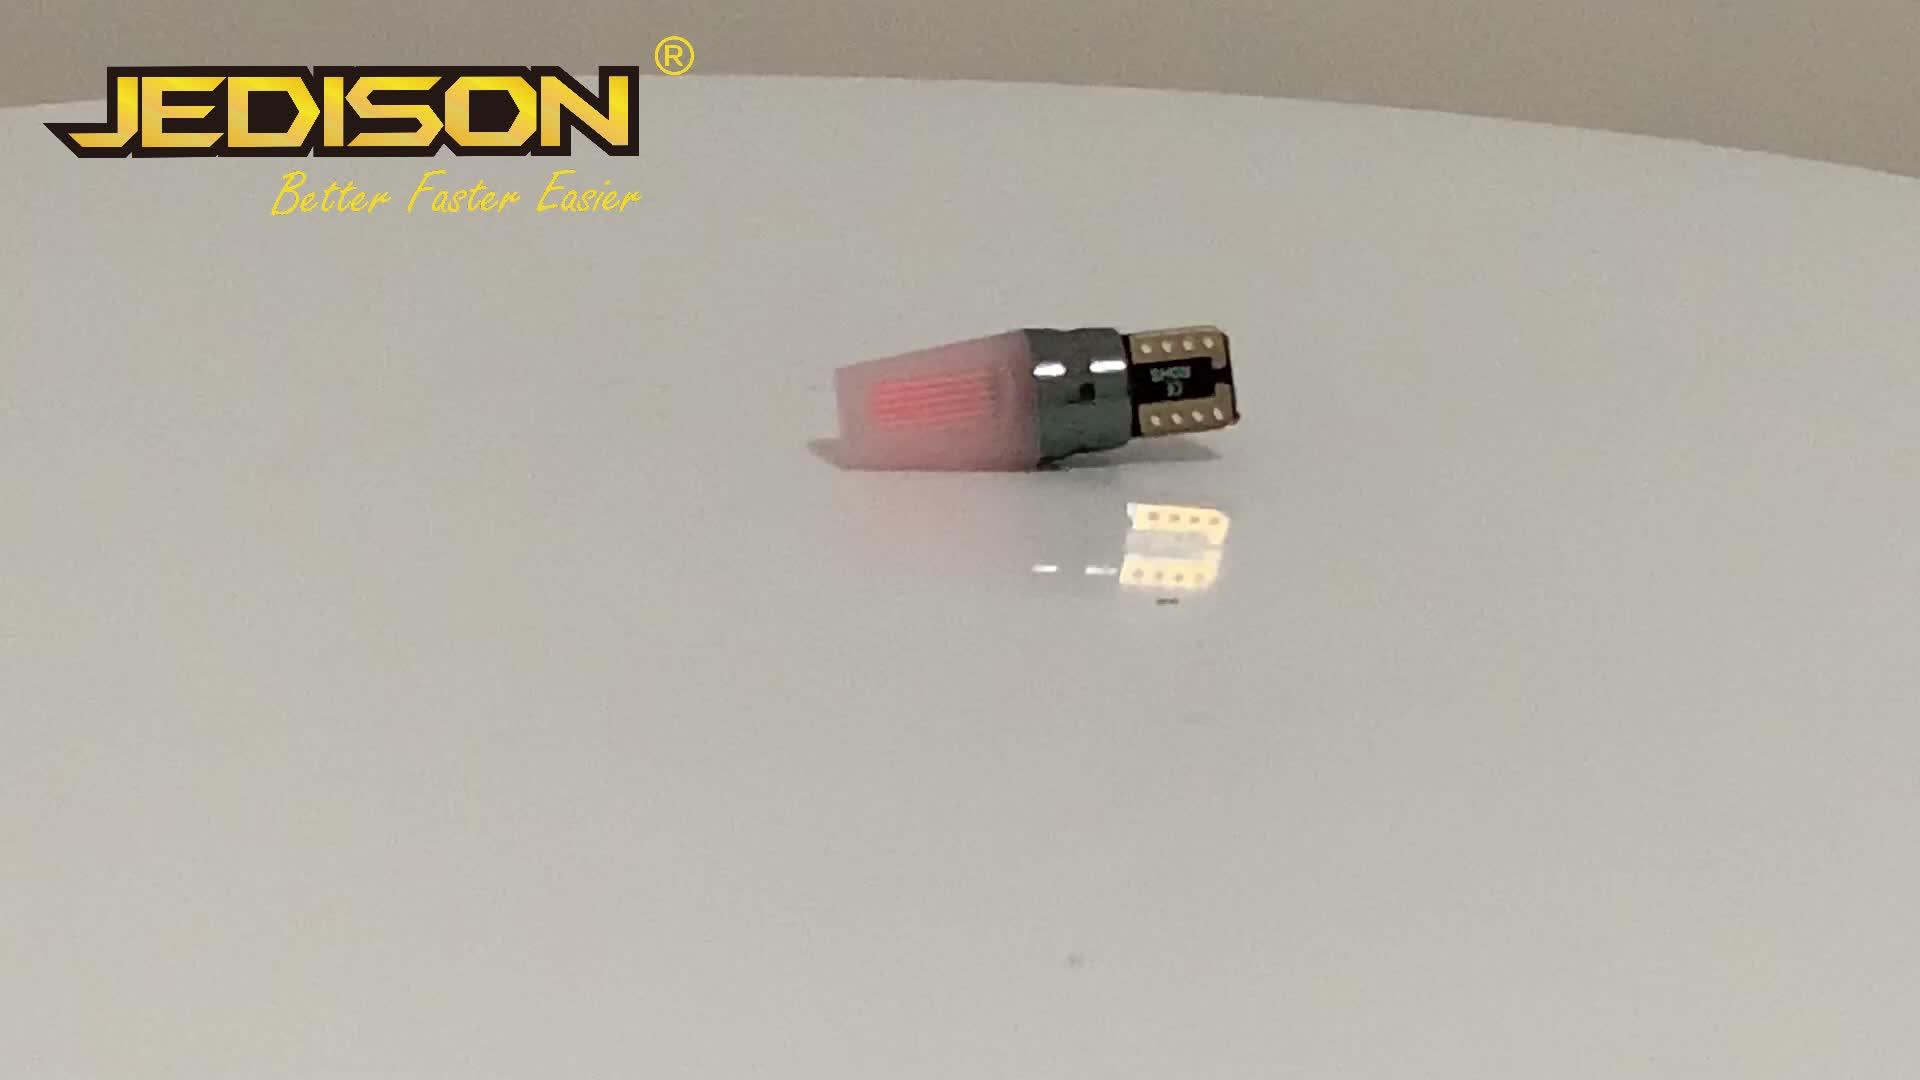 12v 24v T10 COB 웨지 주차 돔 라이트 자동차 인테리어 슈퍼 밝은 led t10 w5w